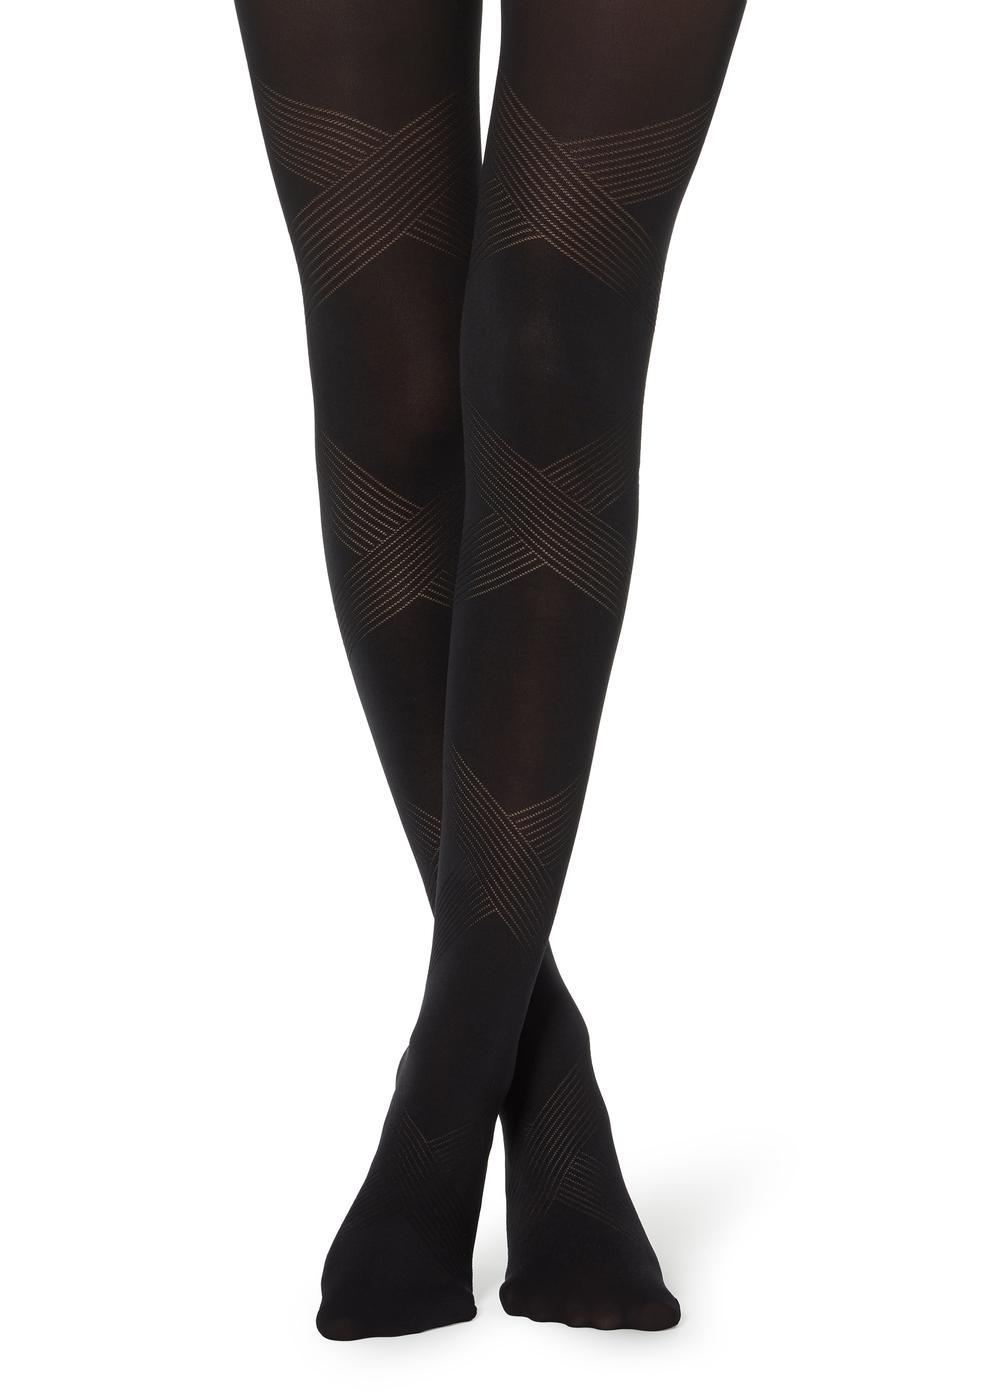 Opaque crisscross tights